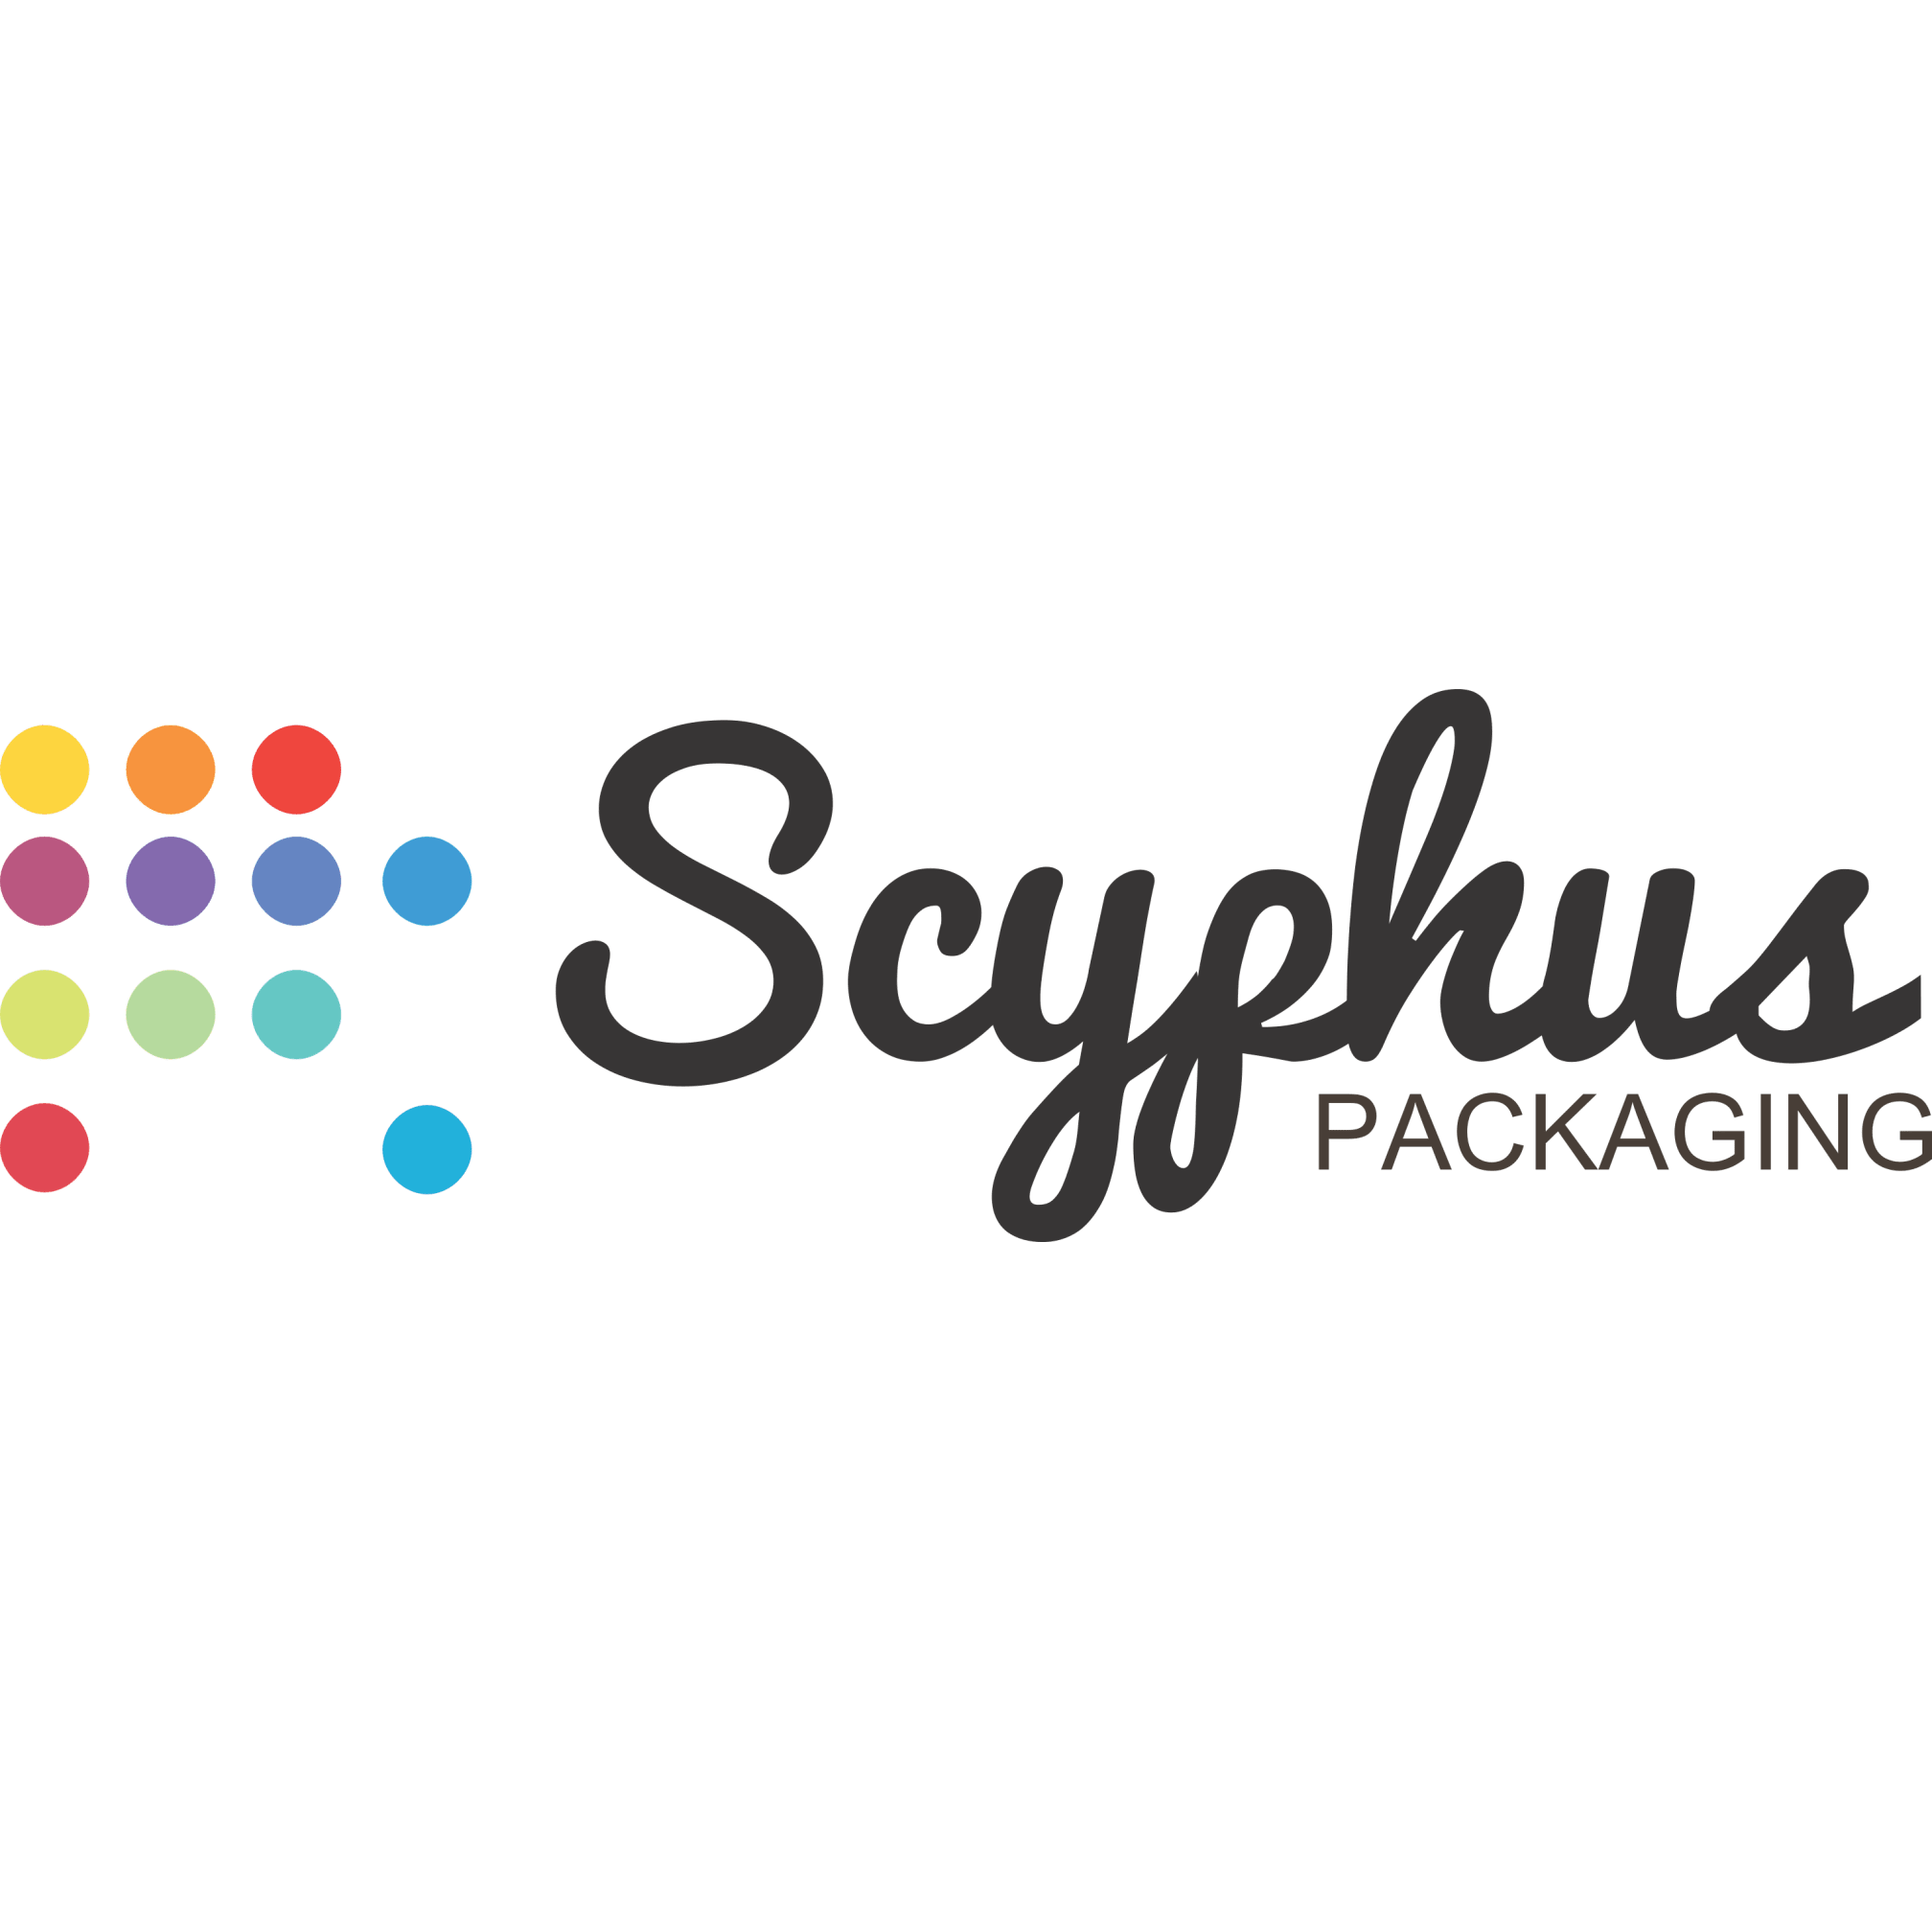 Scyphus Packaging - Northampton, Northamptonshire NN7 1AH - 01604 891398 | ShowMeLocal.com